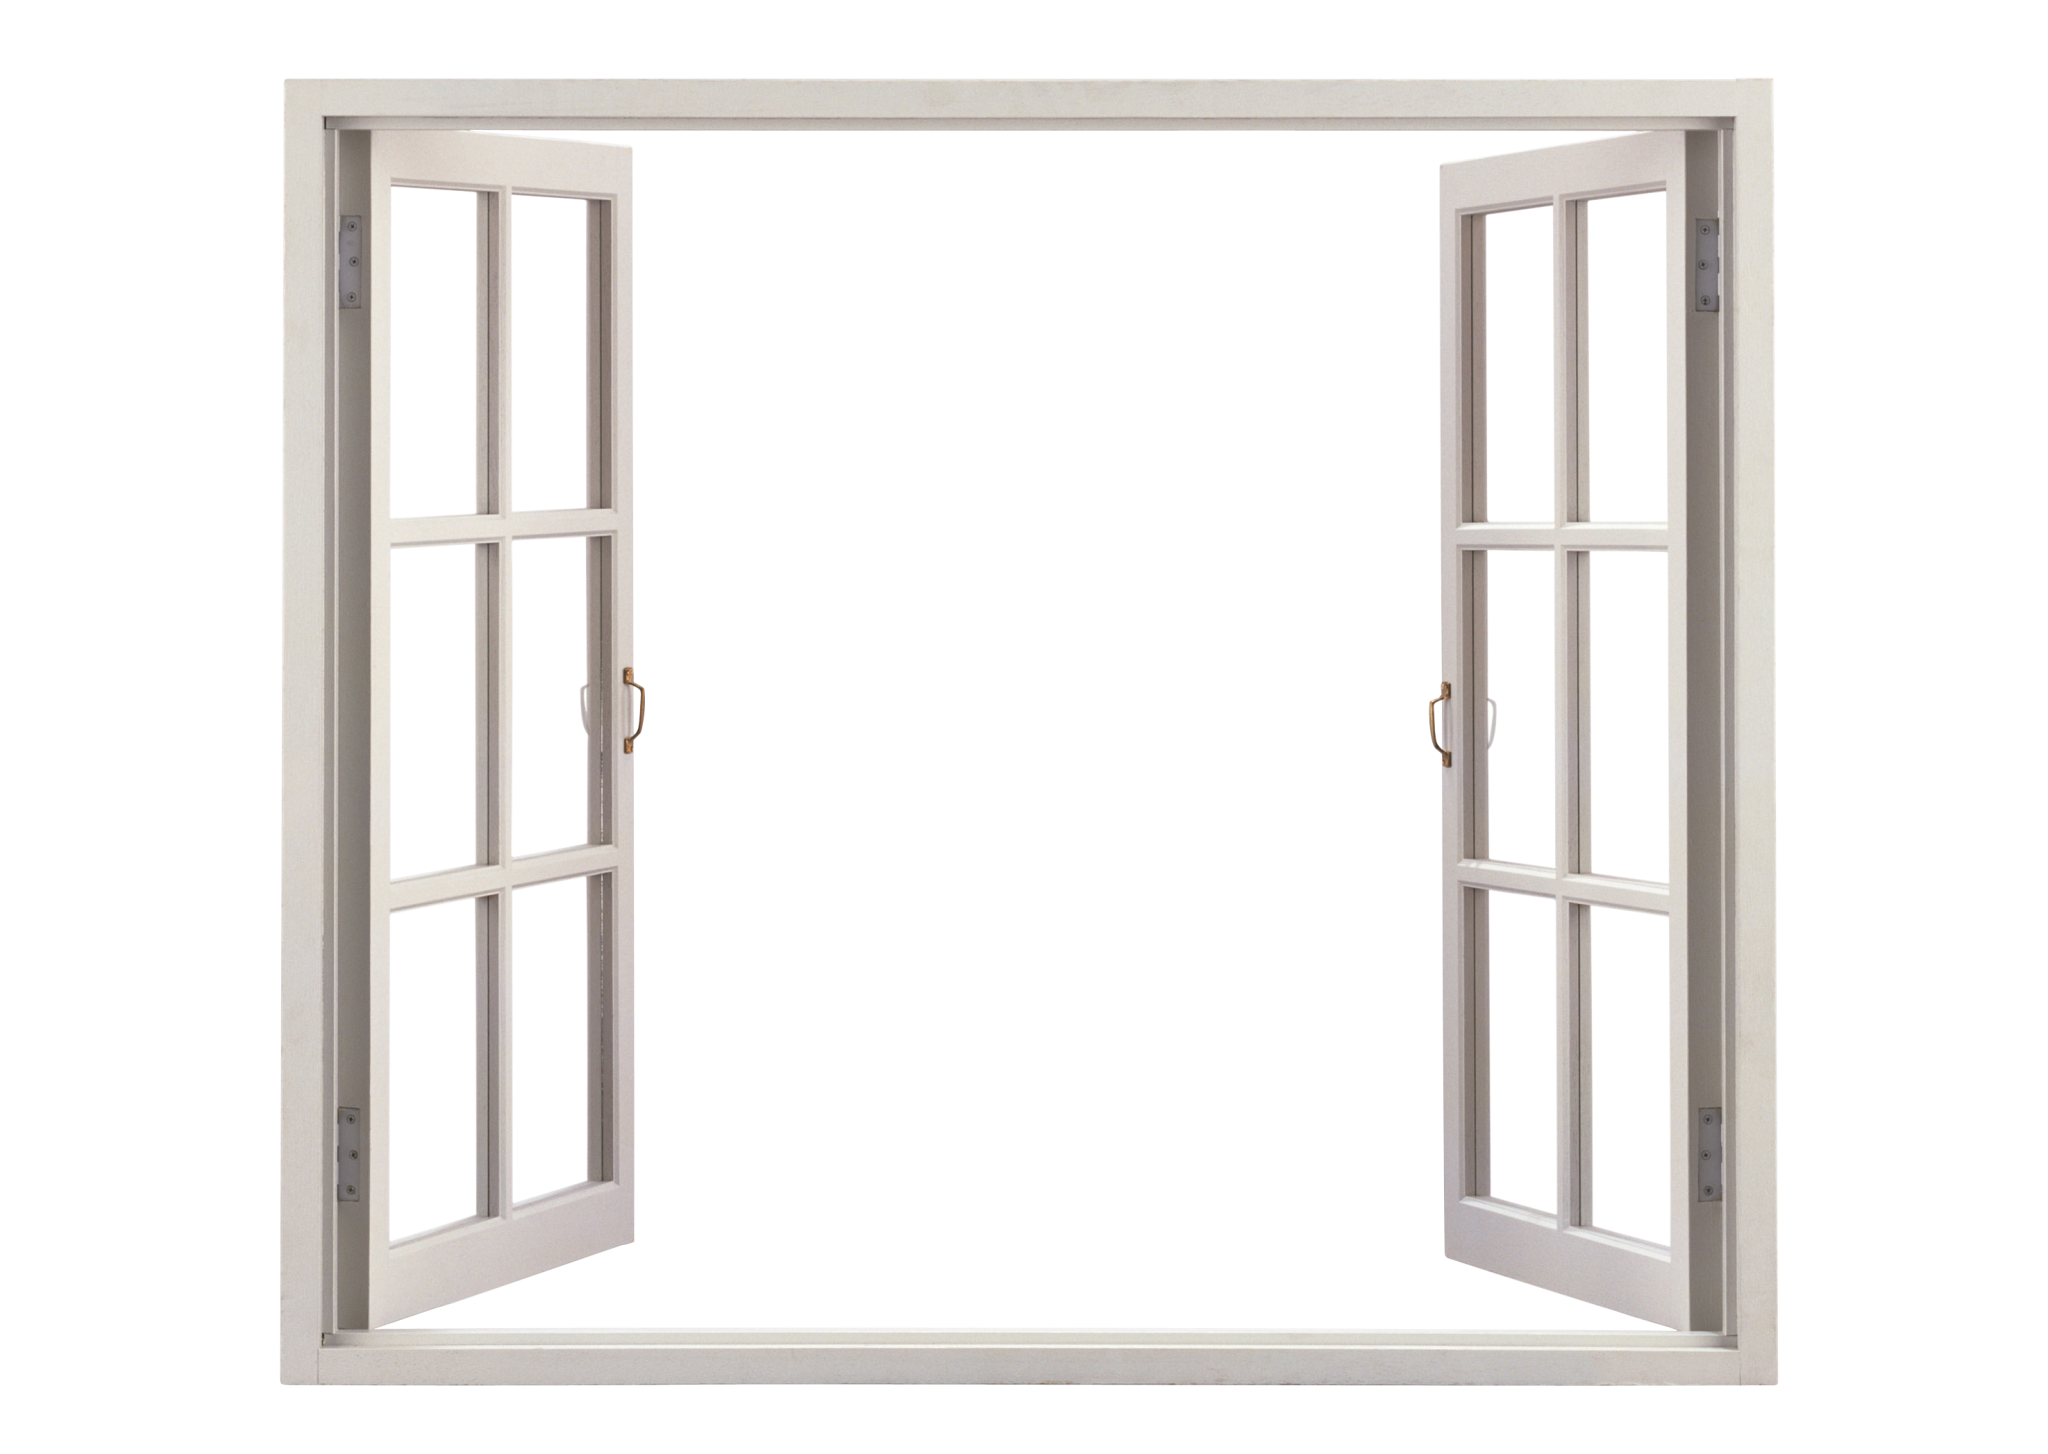 Clipart house window transparent download Toronto | HomeShine - Professional Window & Gutter Cleaning transparent download